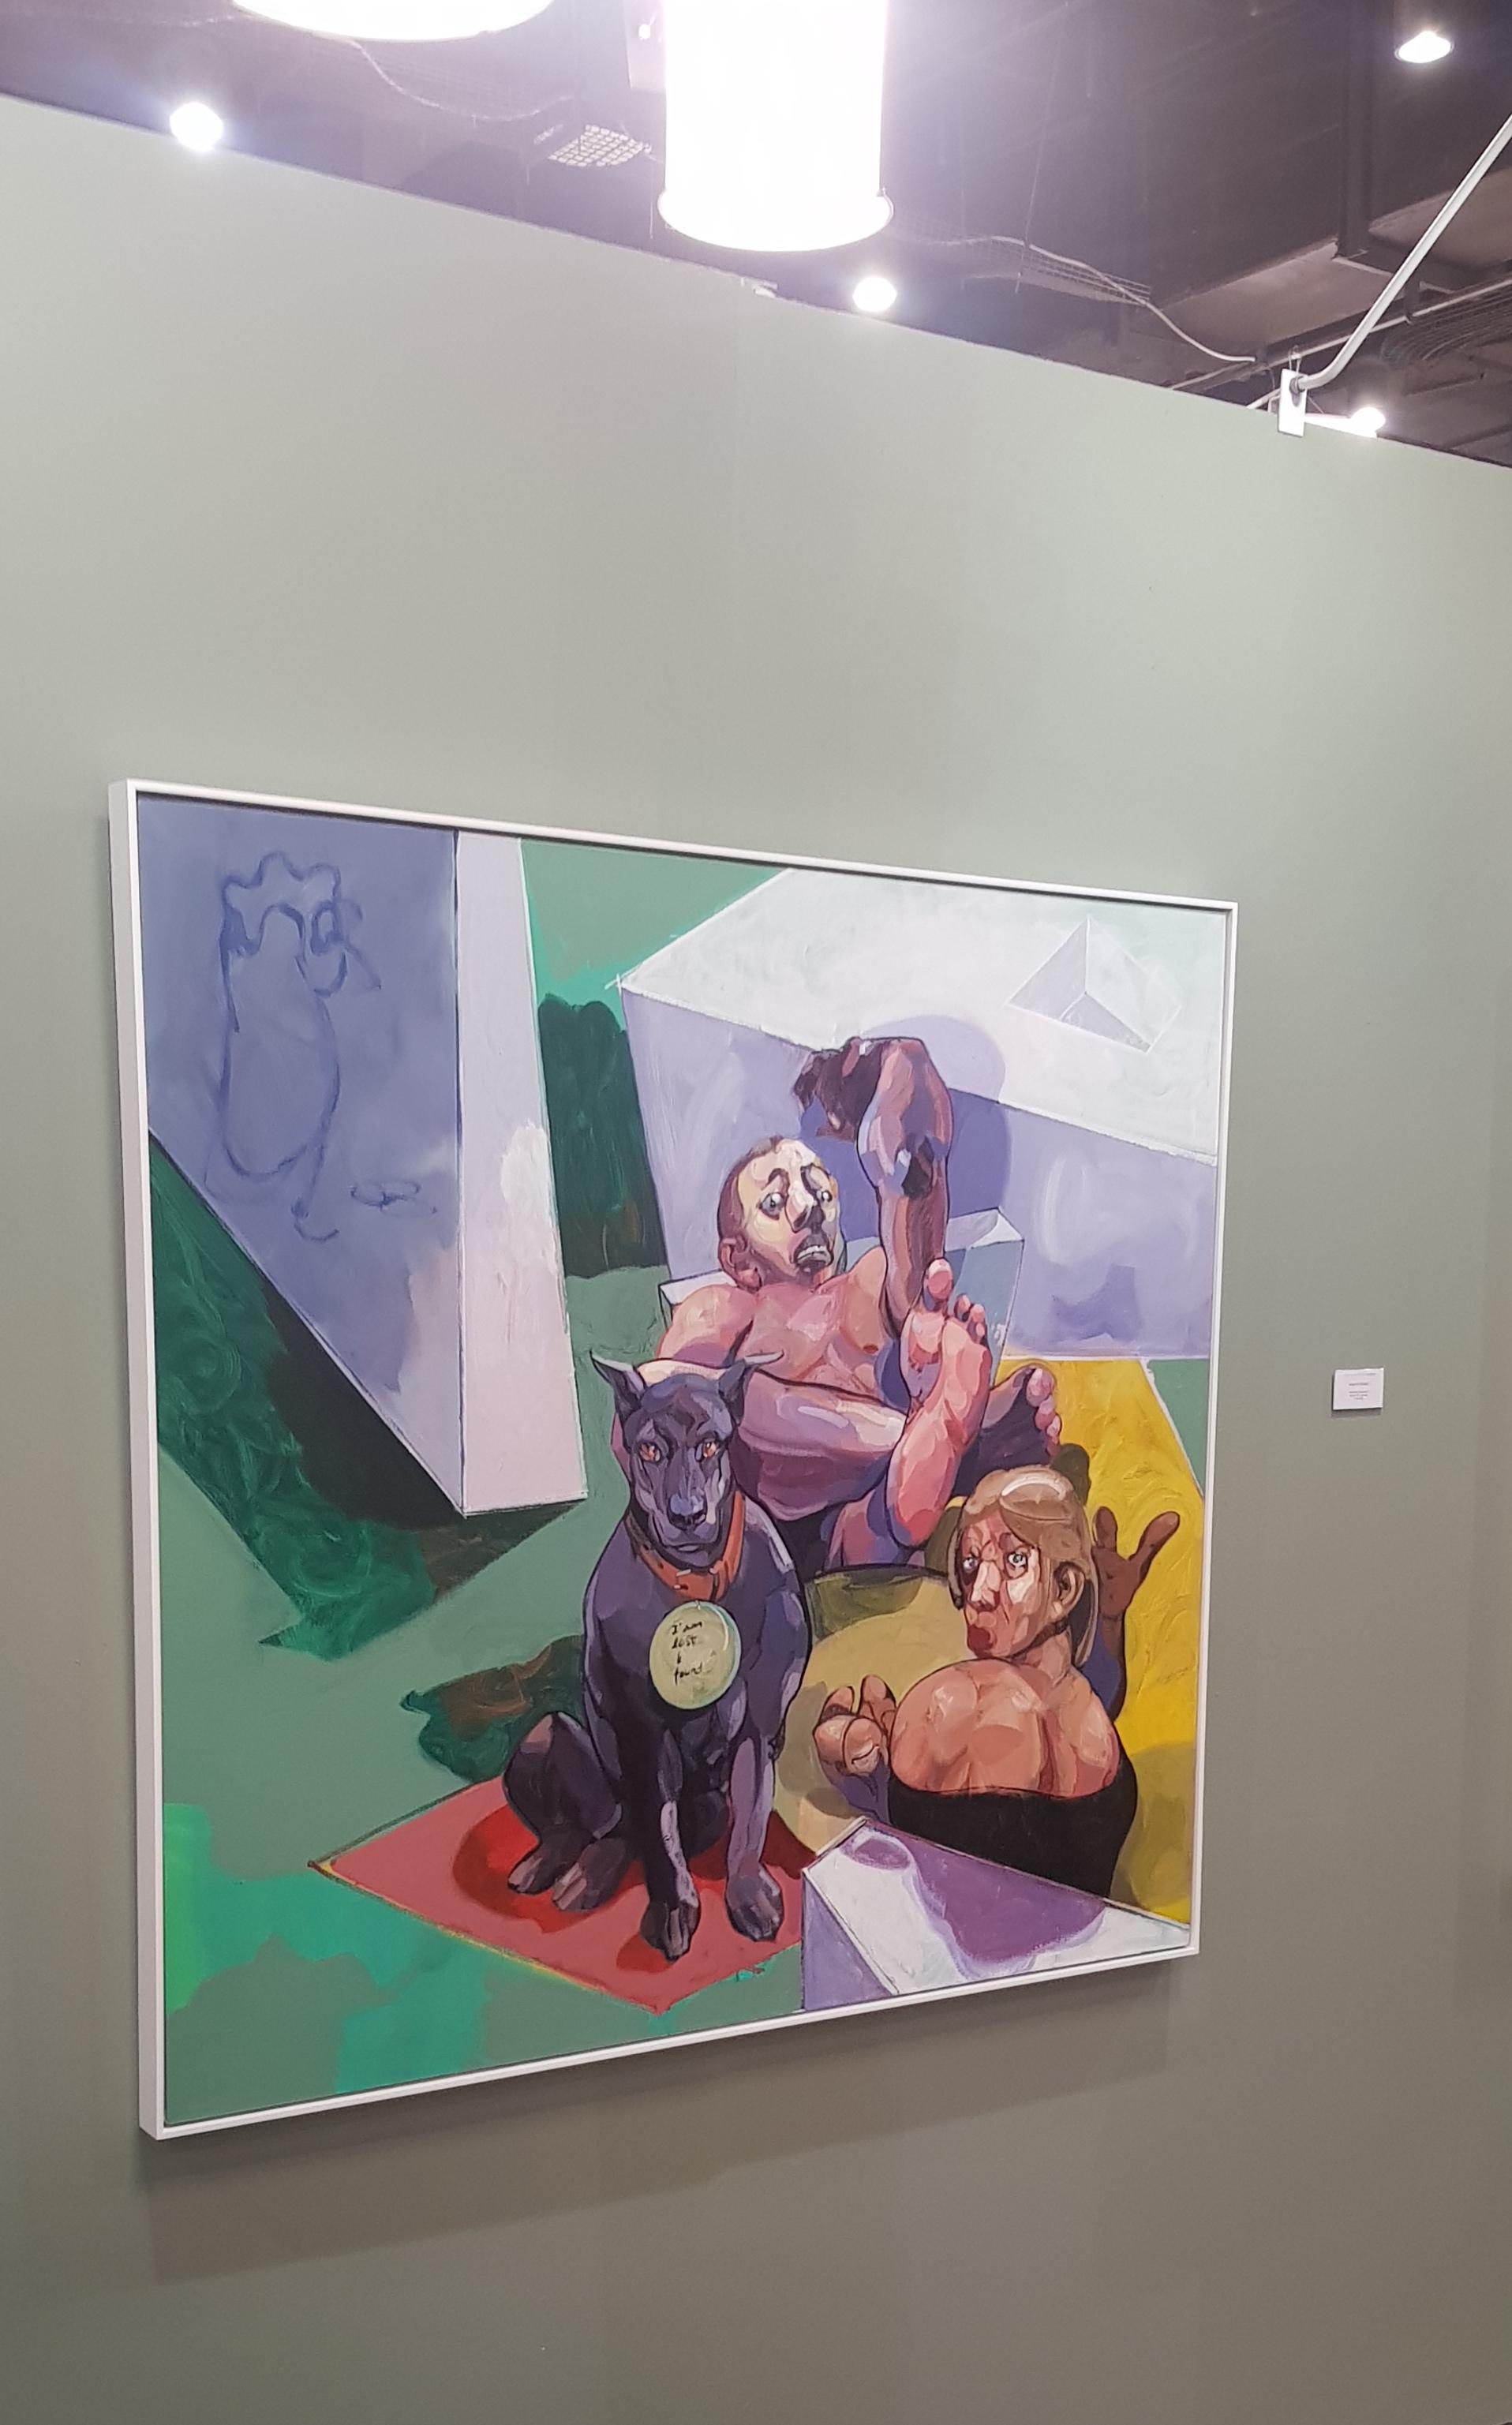 Indefinite Feature 3 by Nigatu Tsehay, Christopher Moller Gallery, FNB Joburg Art Fair 2018 | Photo credit: Ayodeji Rotinwa